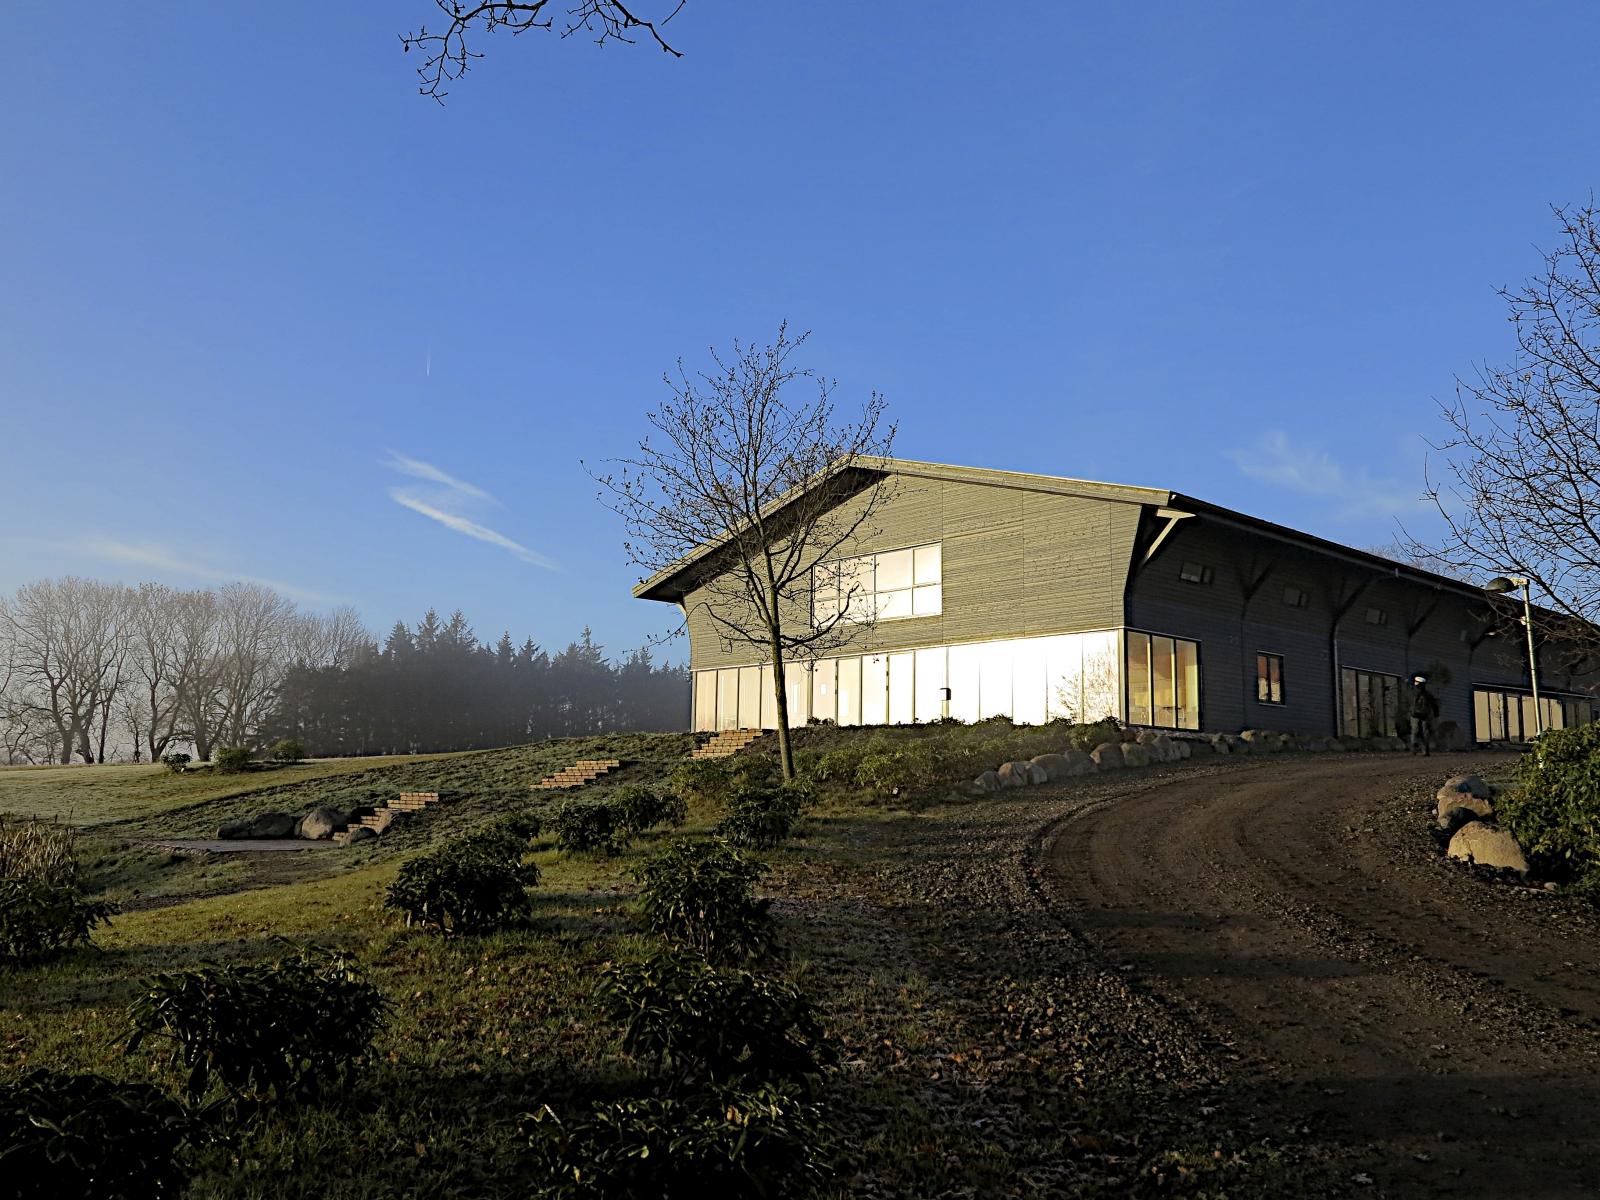 IMG_5051Marjatta kulturhus dam-min